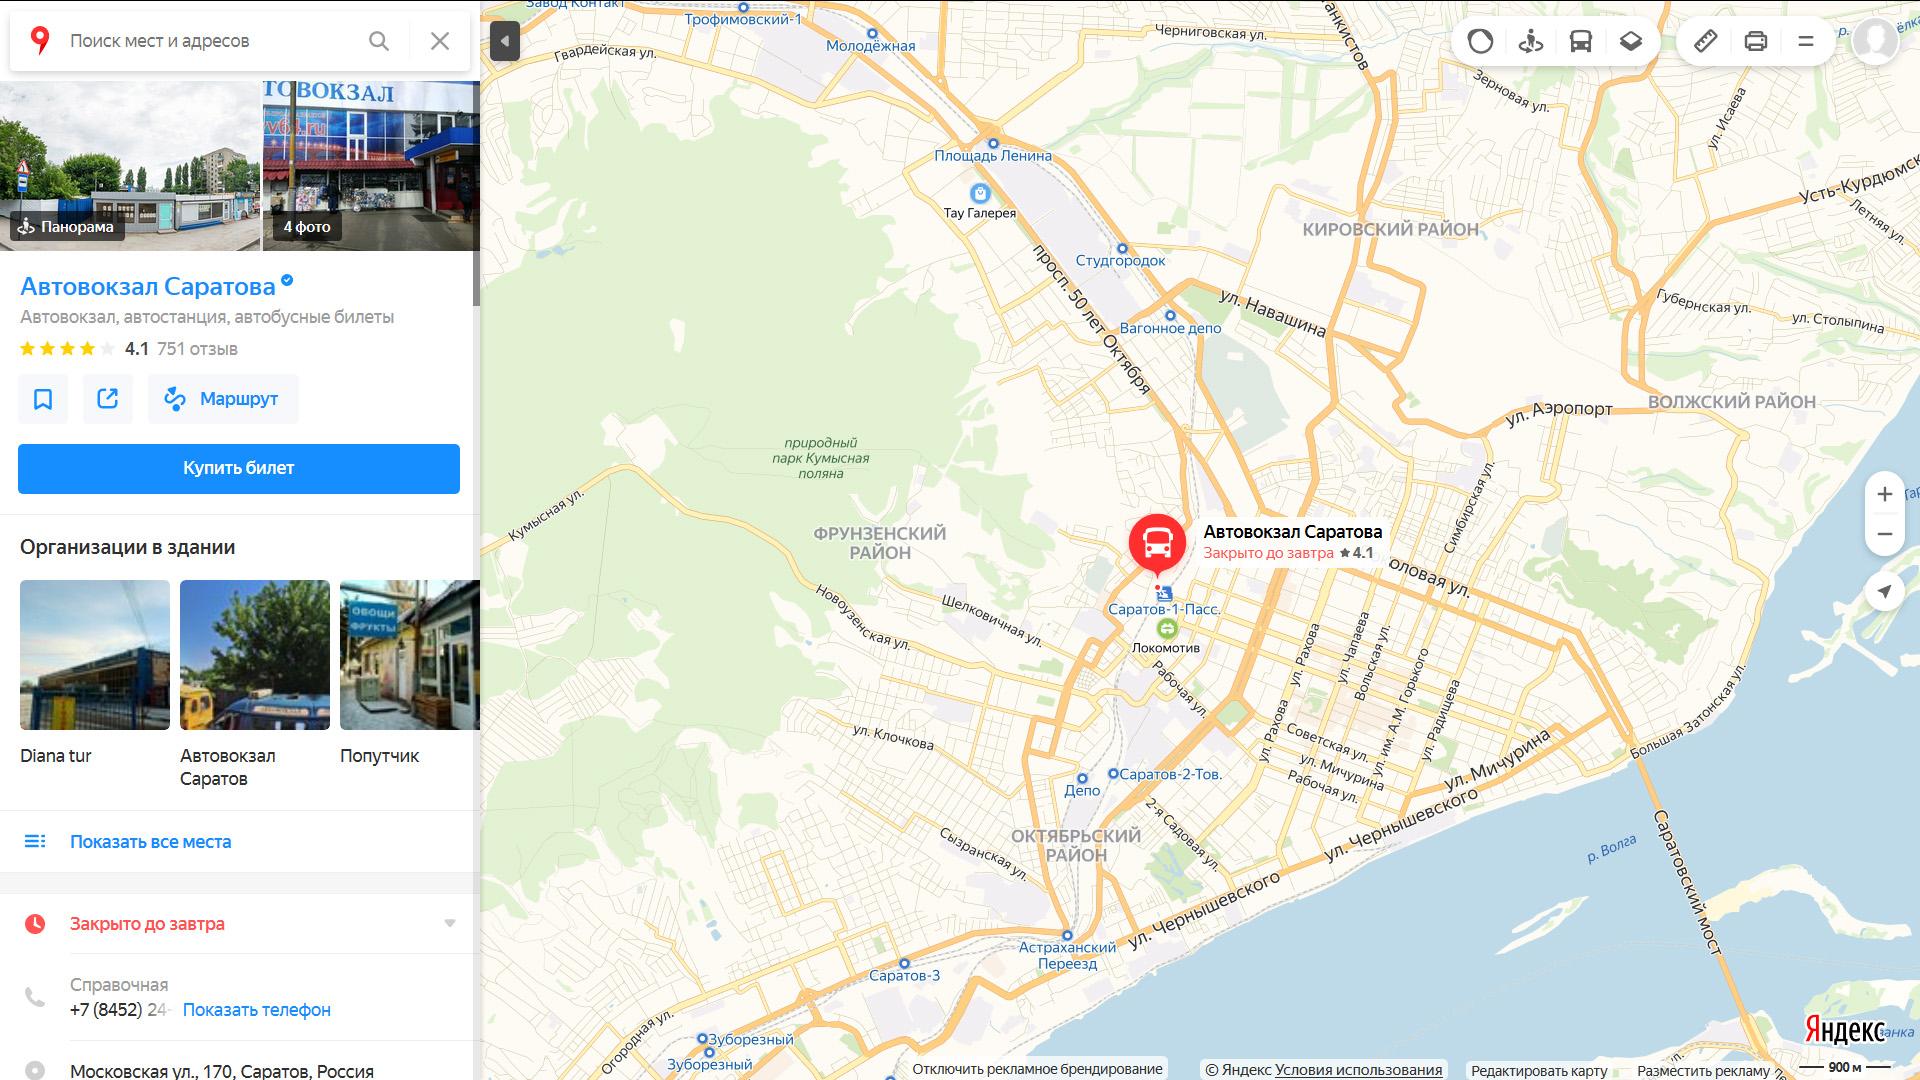 Автовокзал в Саратове на карте где находится